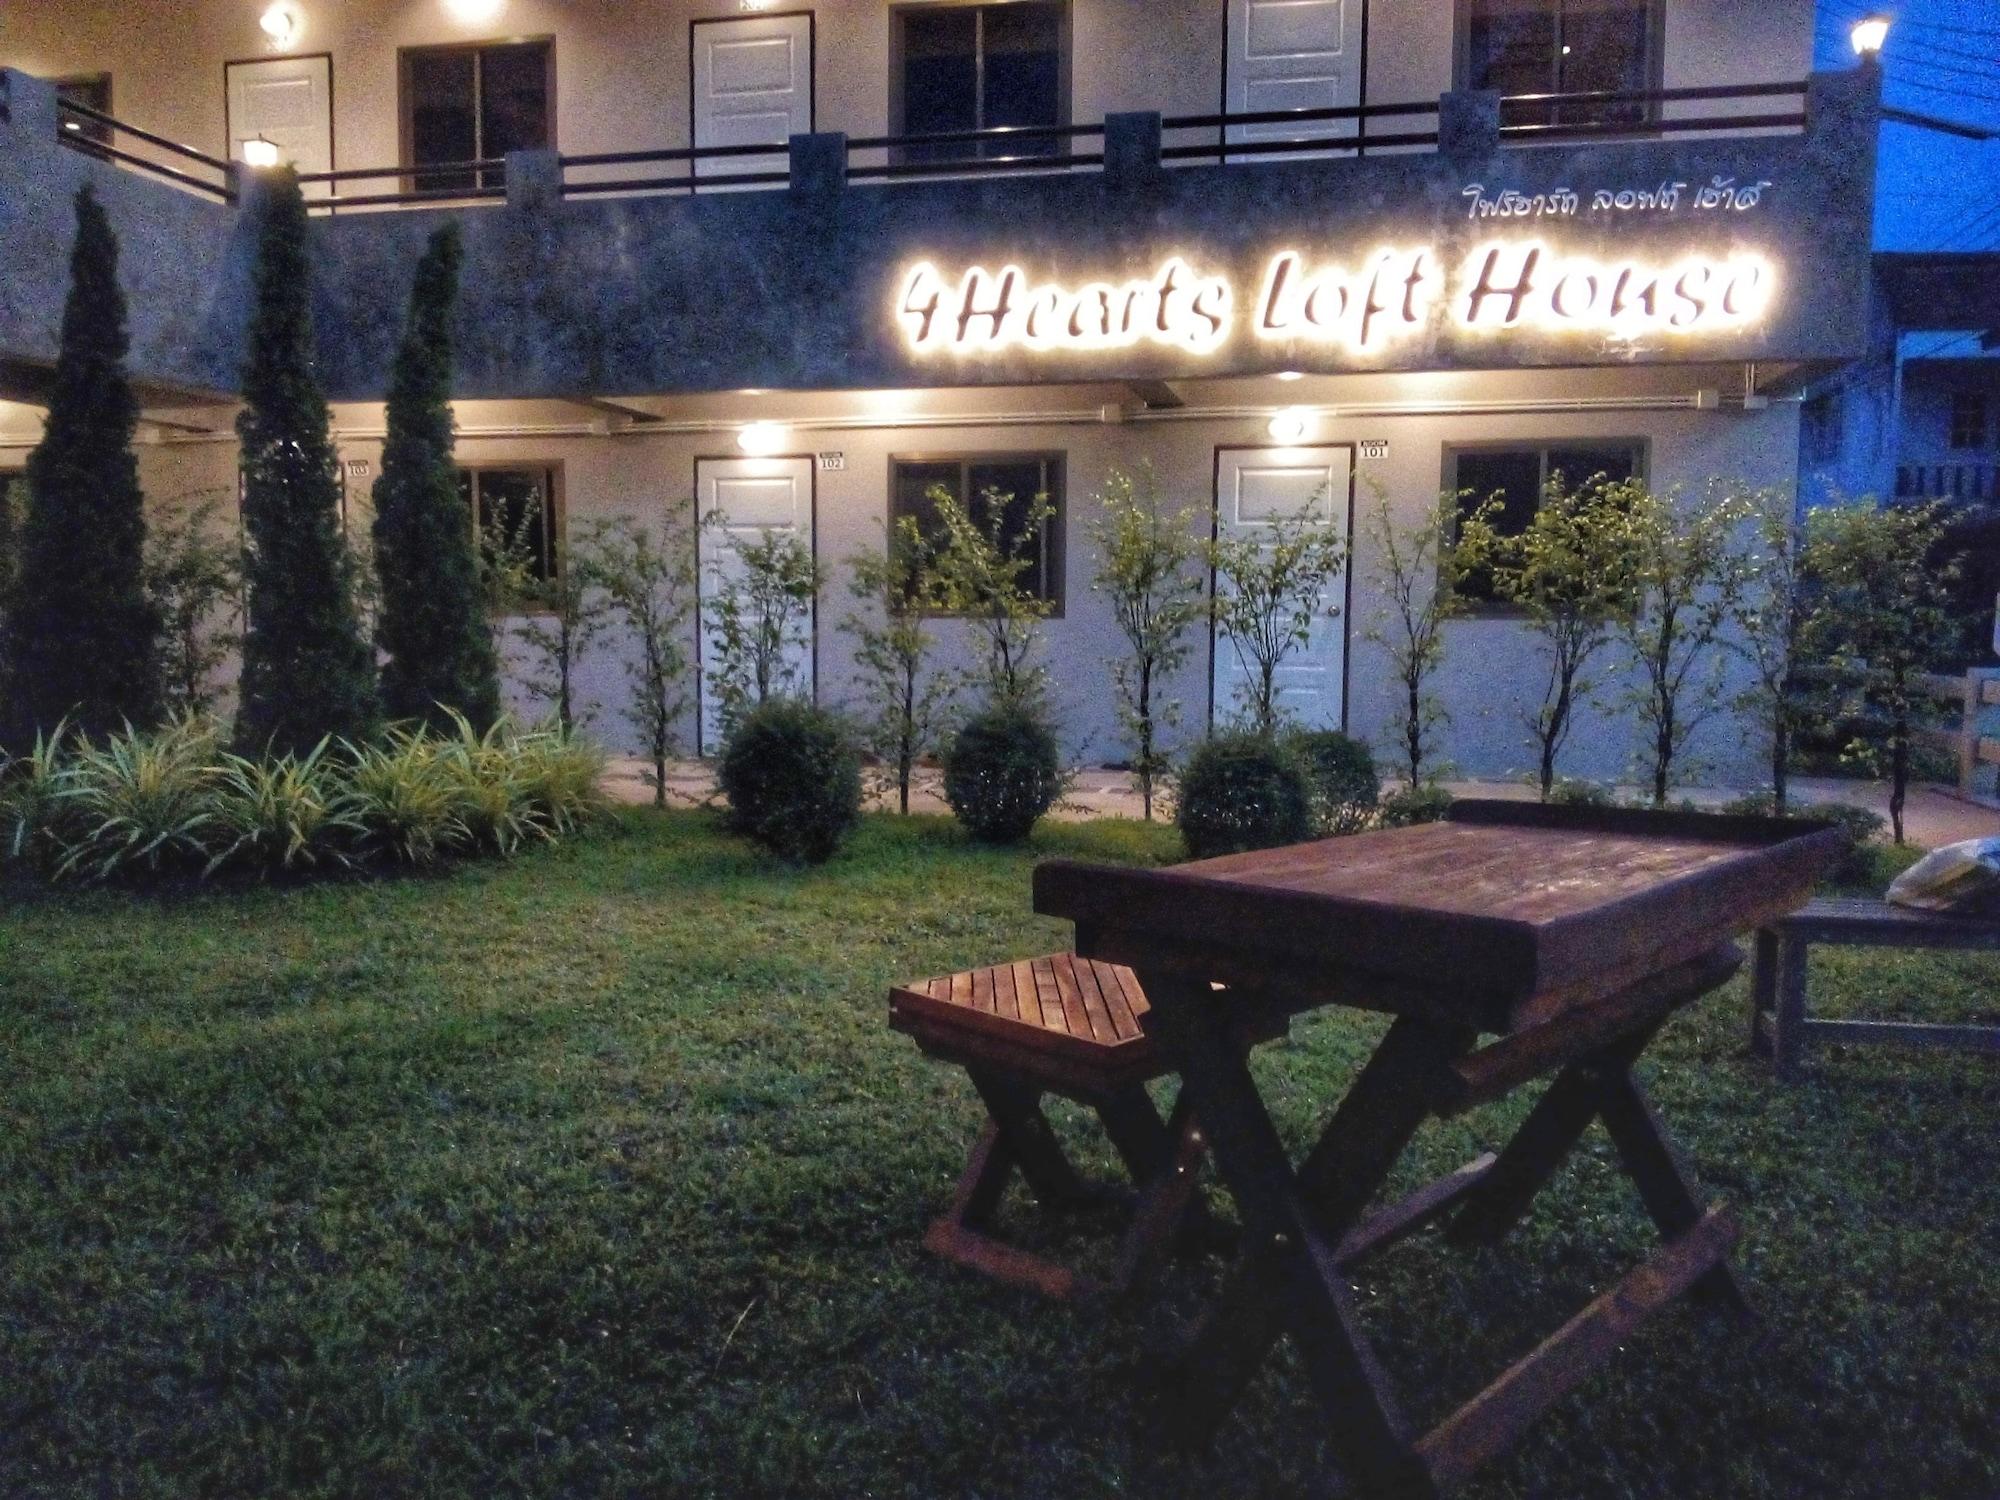 4Hearts Loft House, Muang Surat Thani